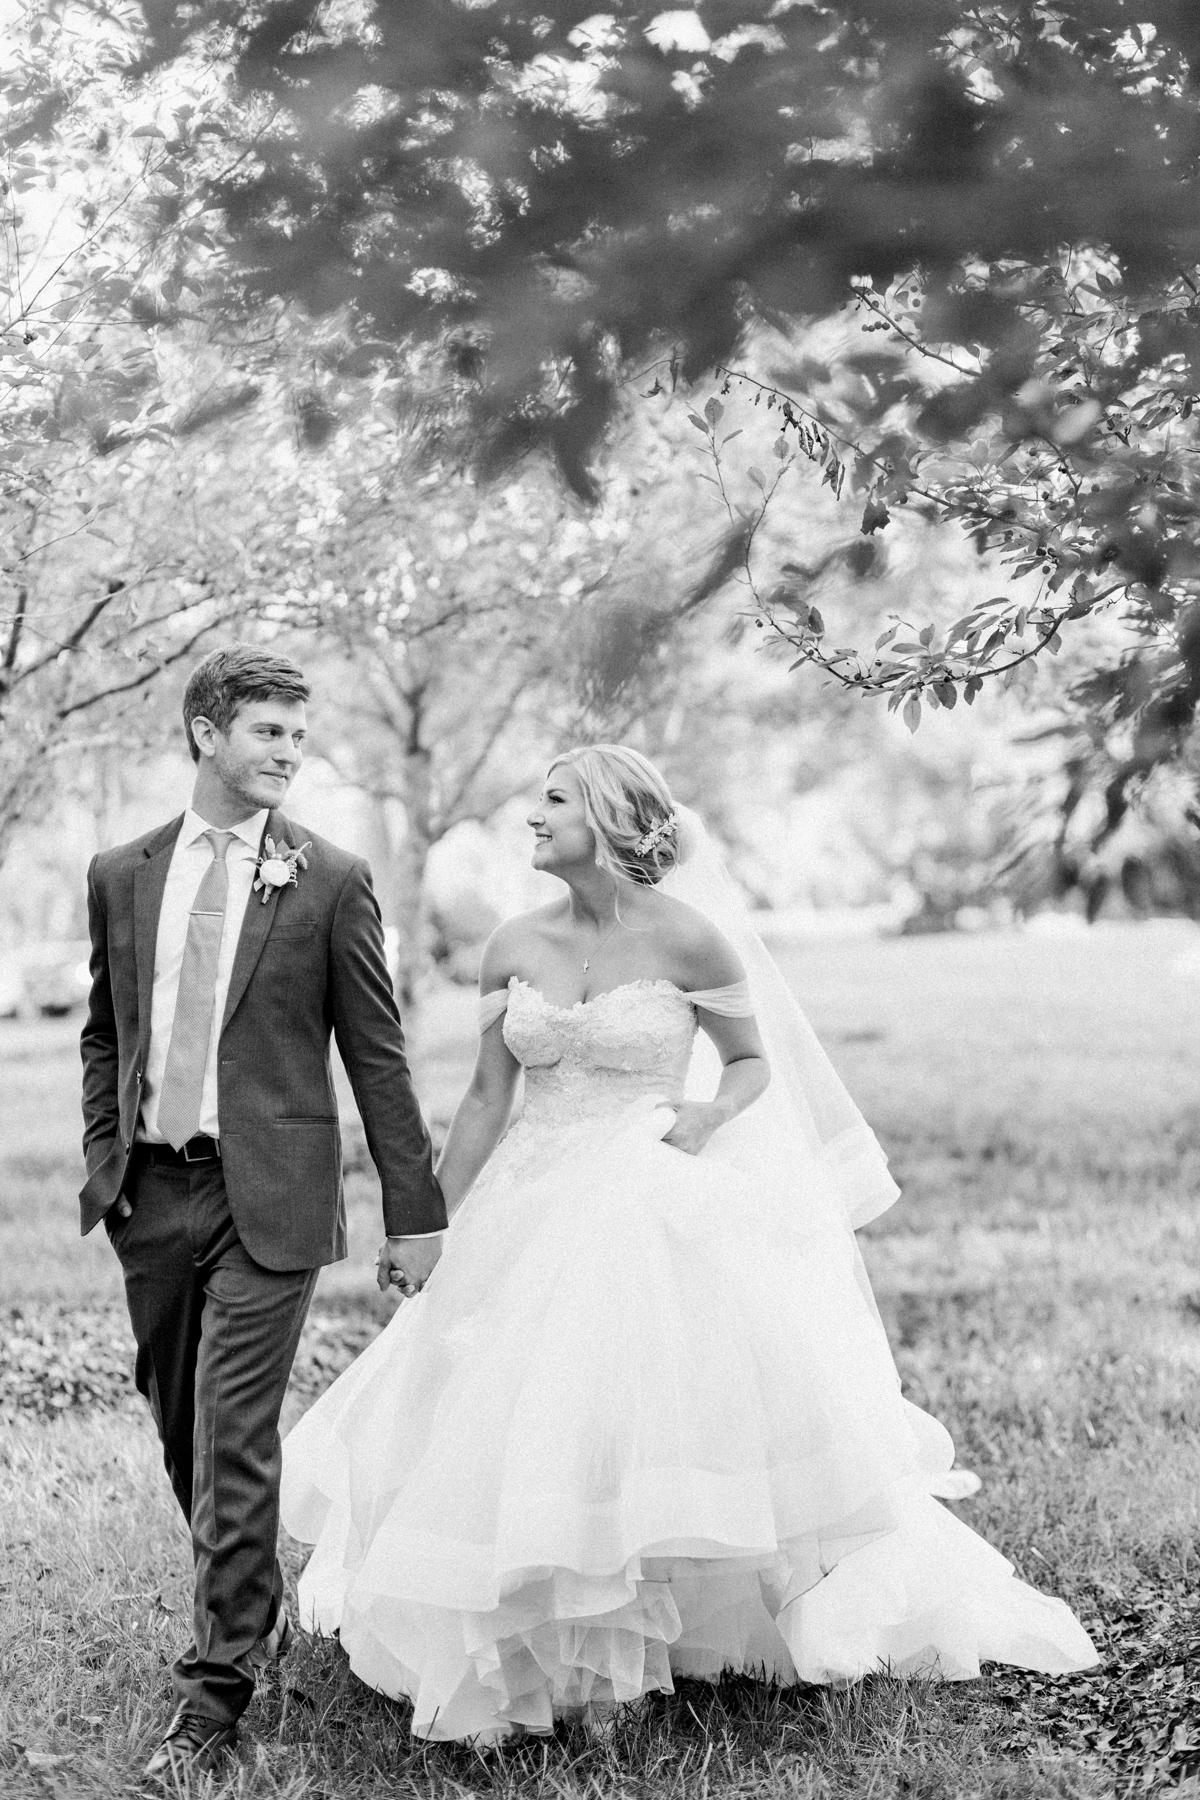 winmock-kinderton-wedding-053.jpg